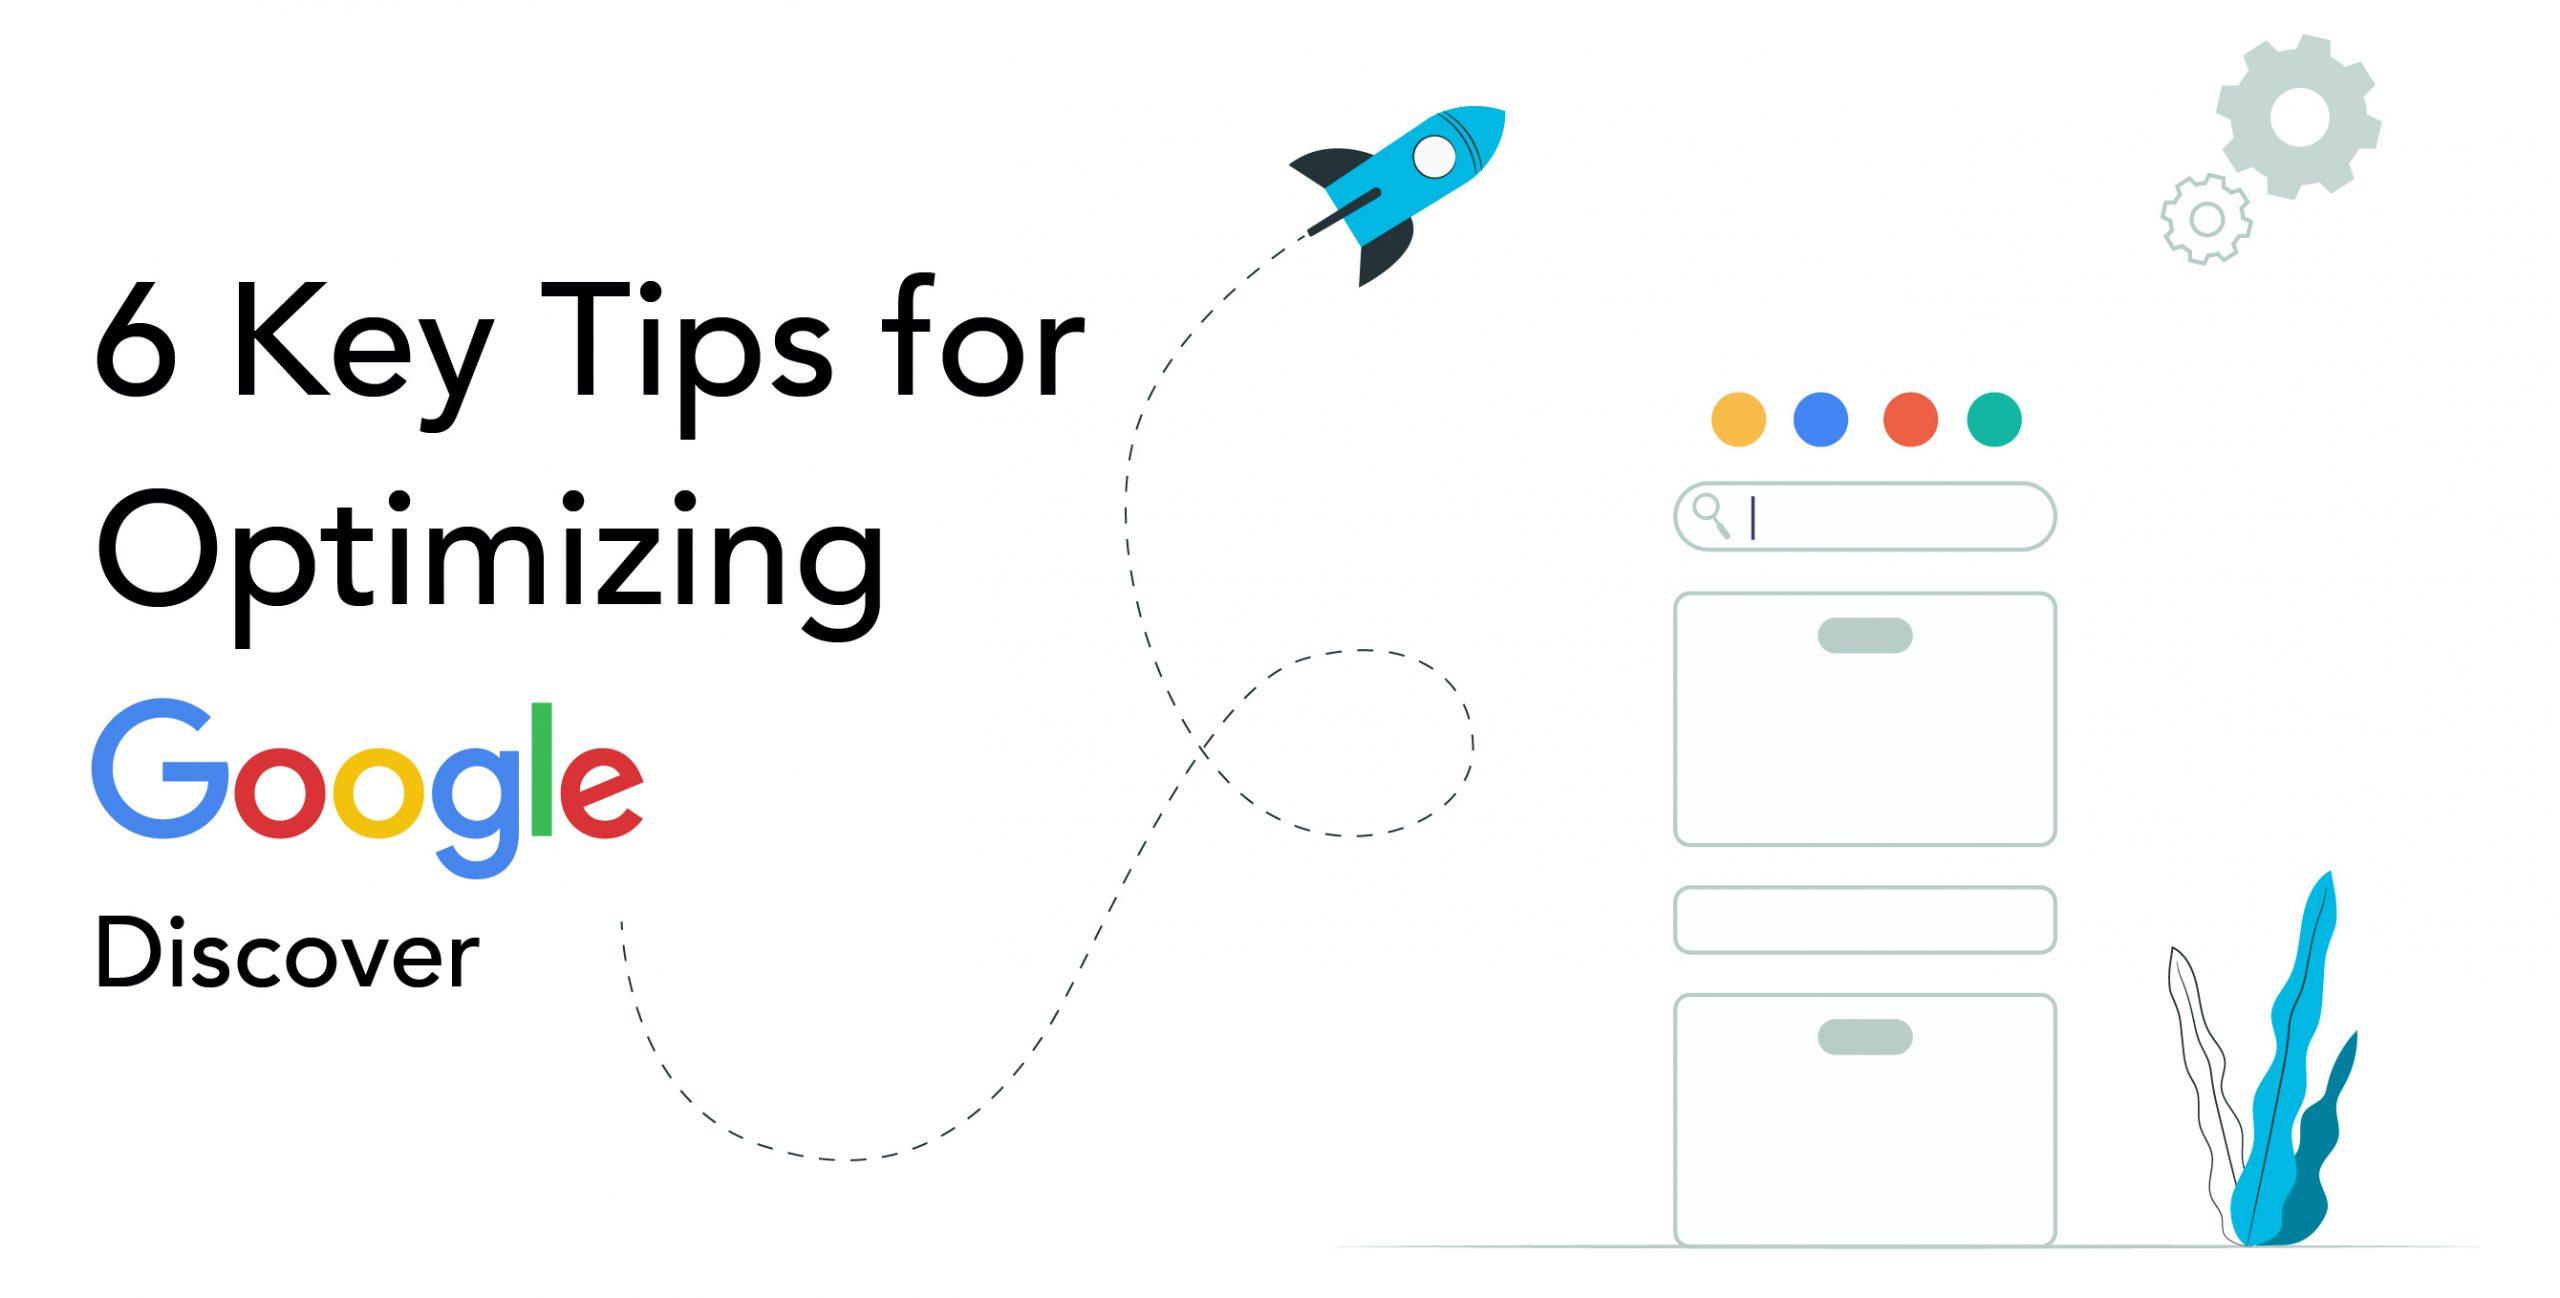 6 Key Tips for Optimizing Google Discover